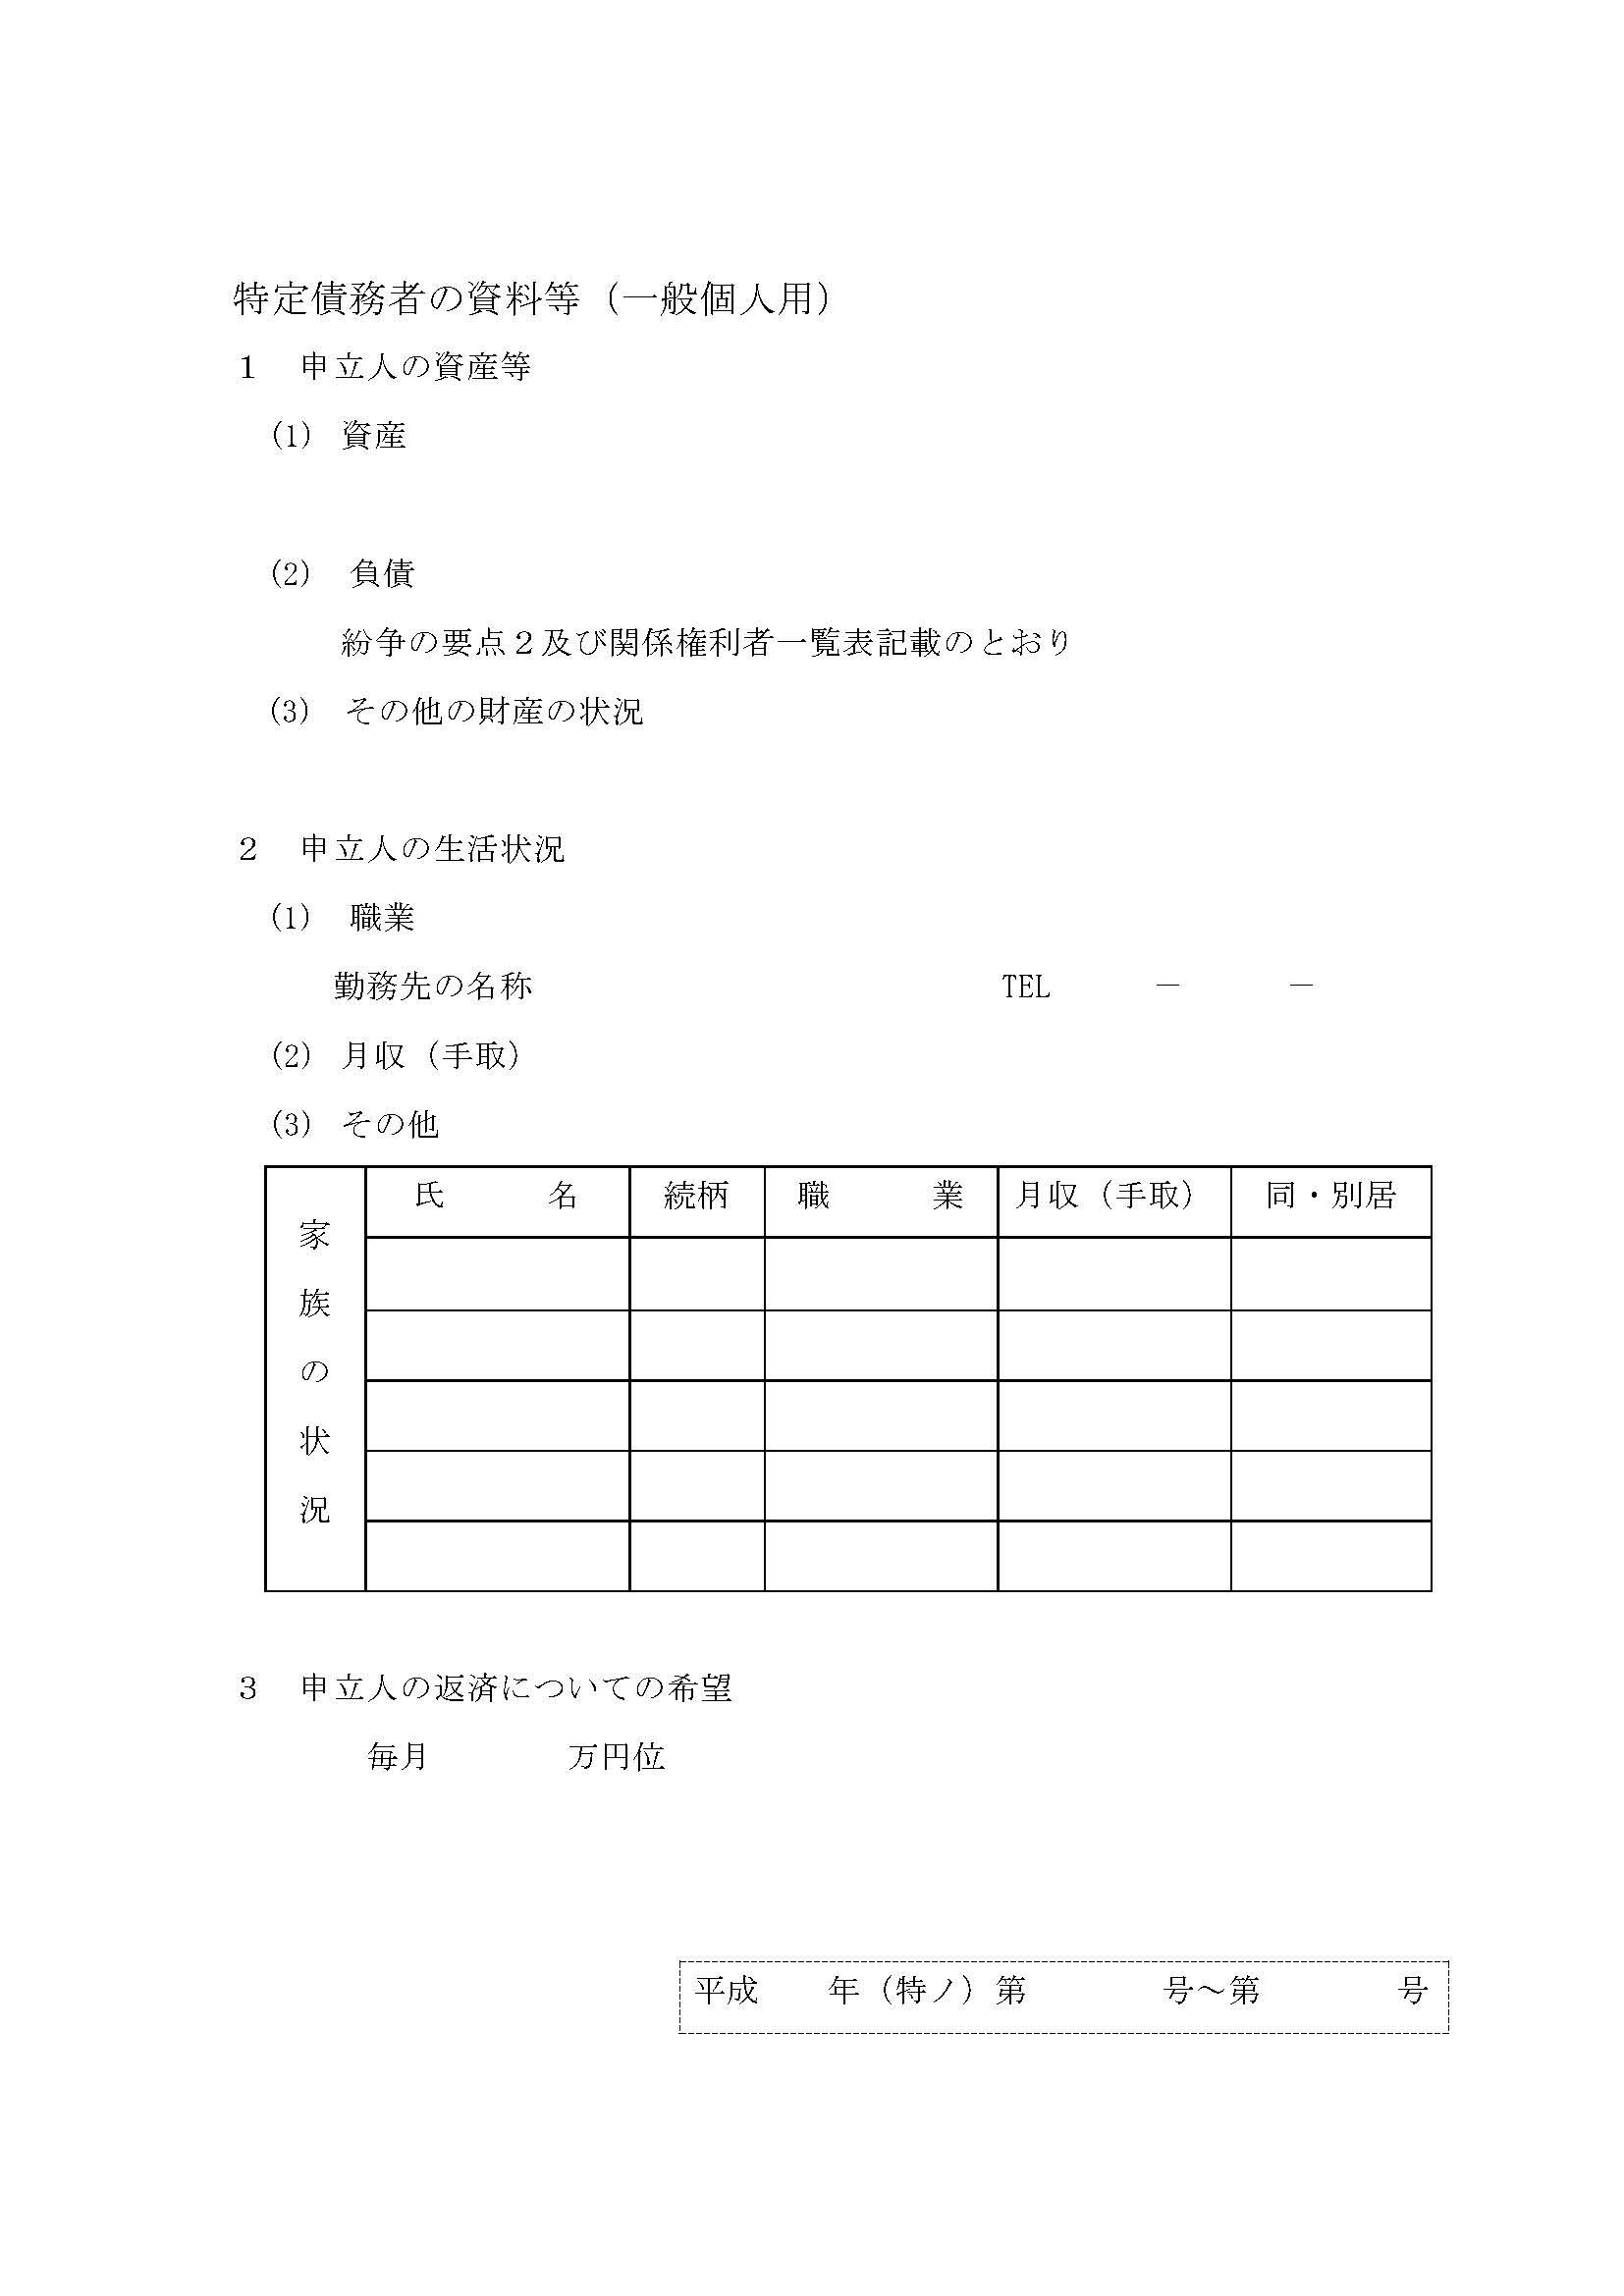 特定債務者の資料等(一般個人用)